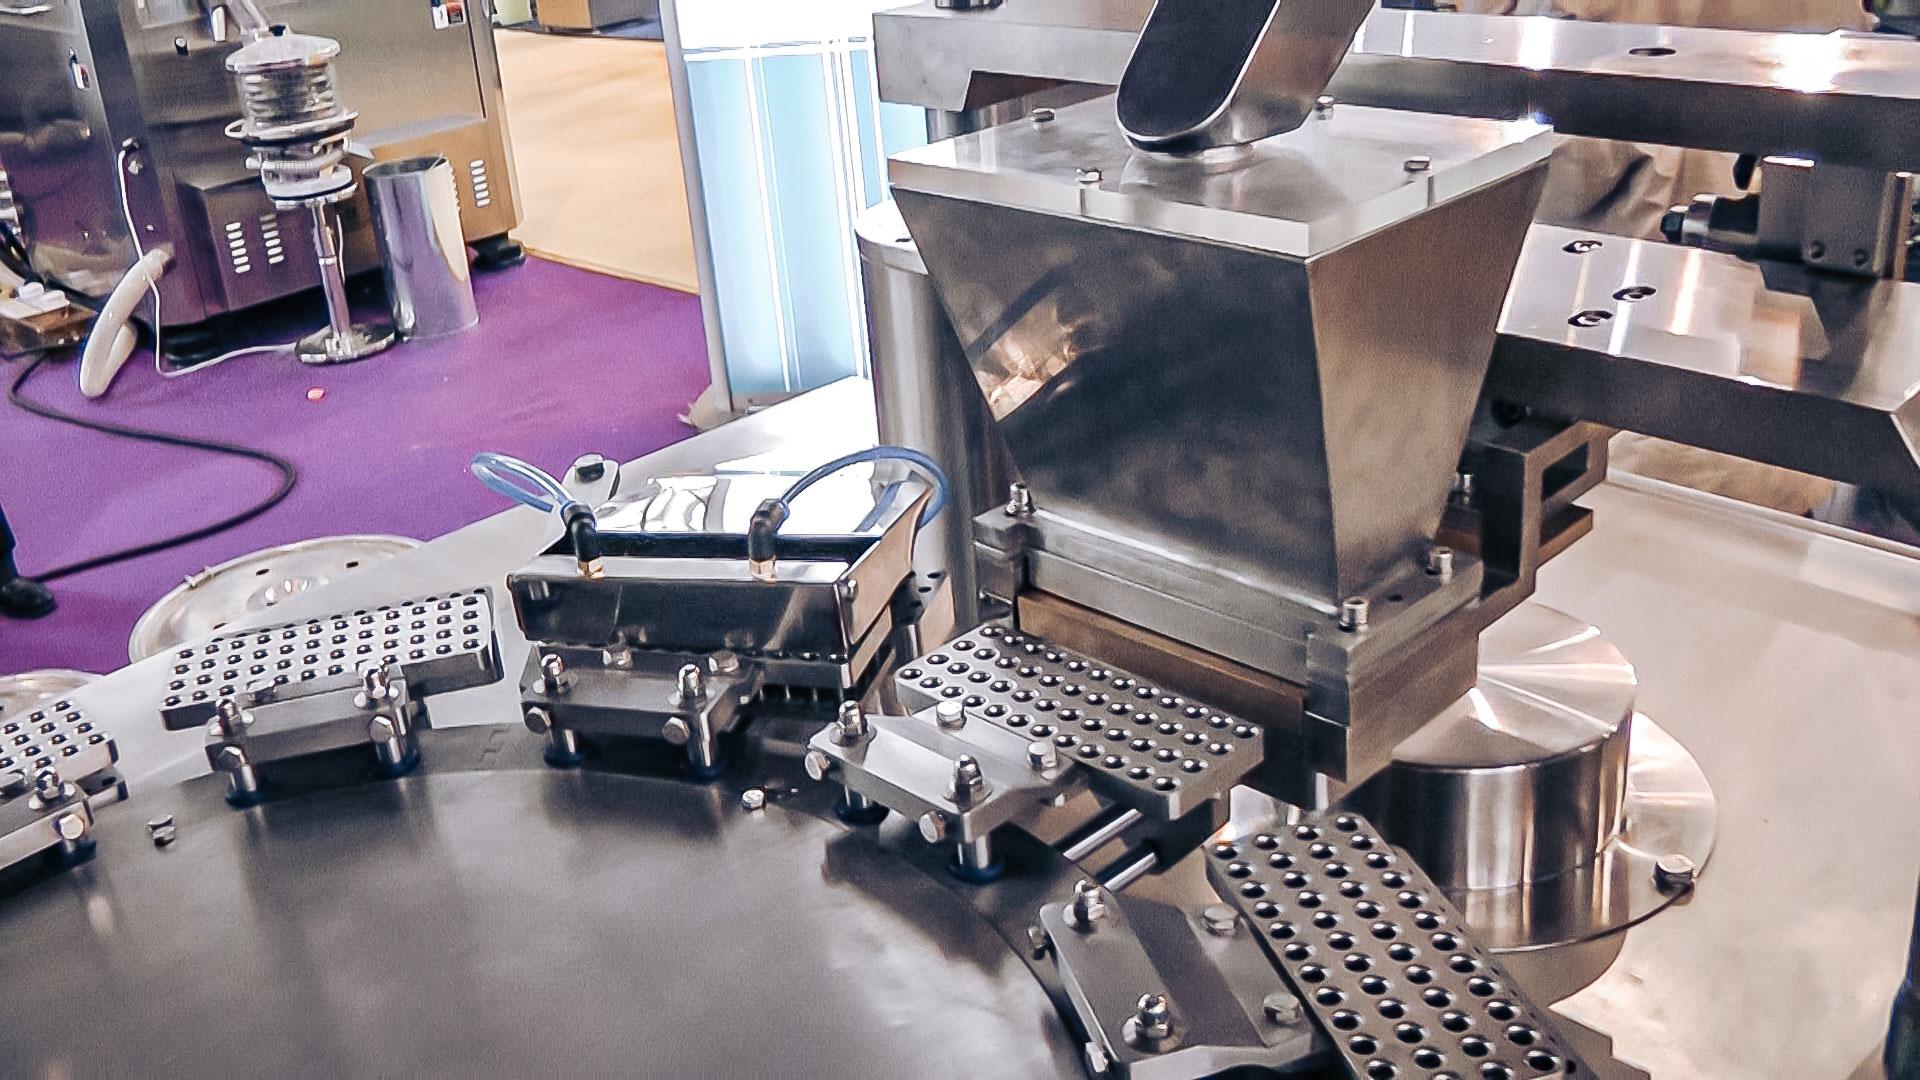 Automatic capsule equipment for hard gelatin capsules in pharmaceutical production